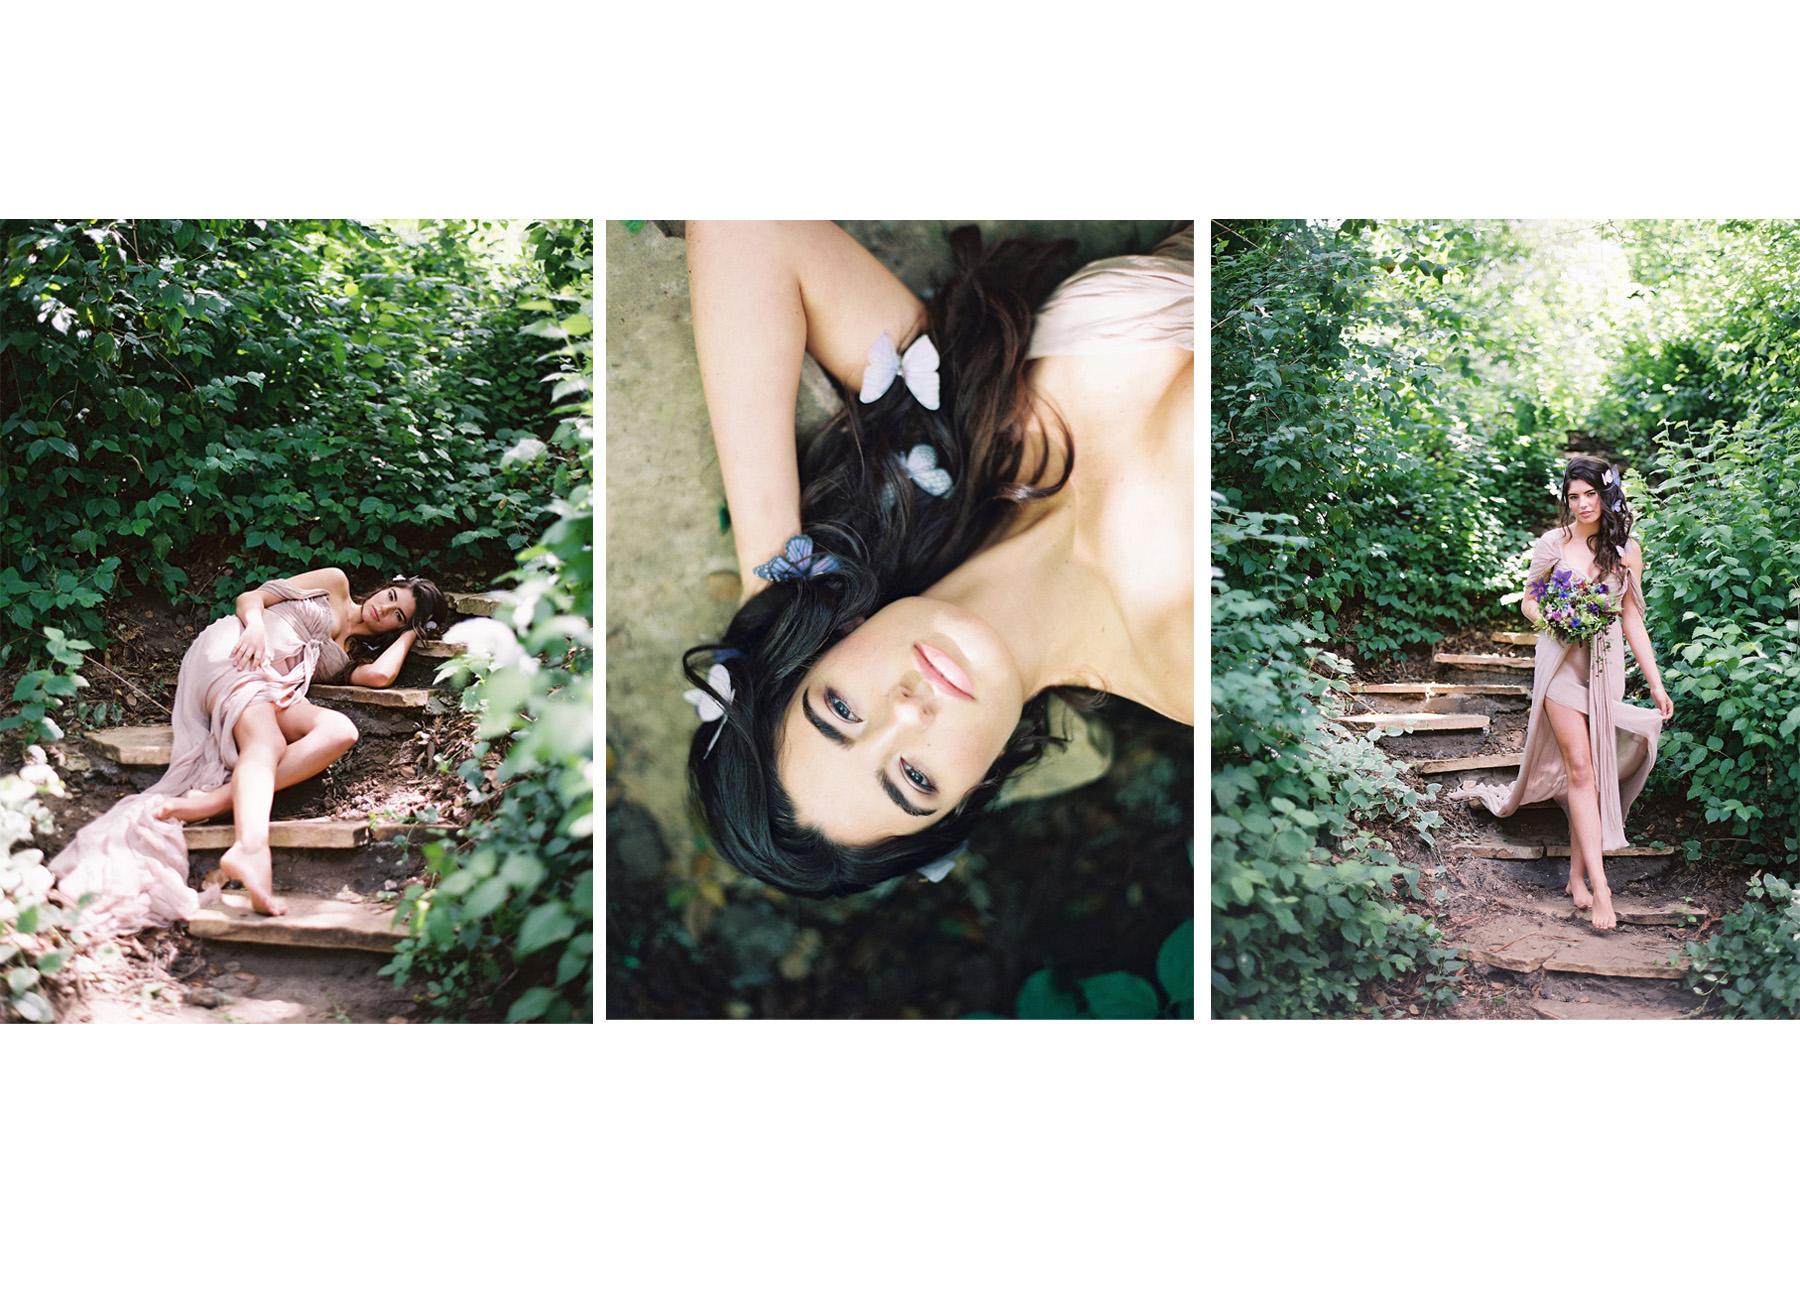 woodland trio 2 copy.jpg